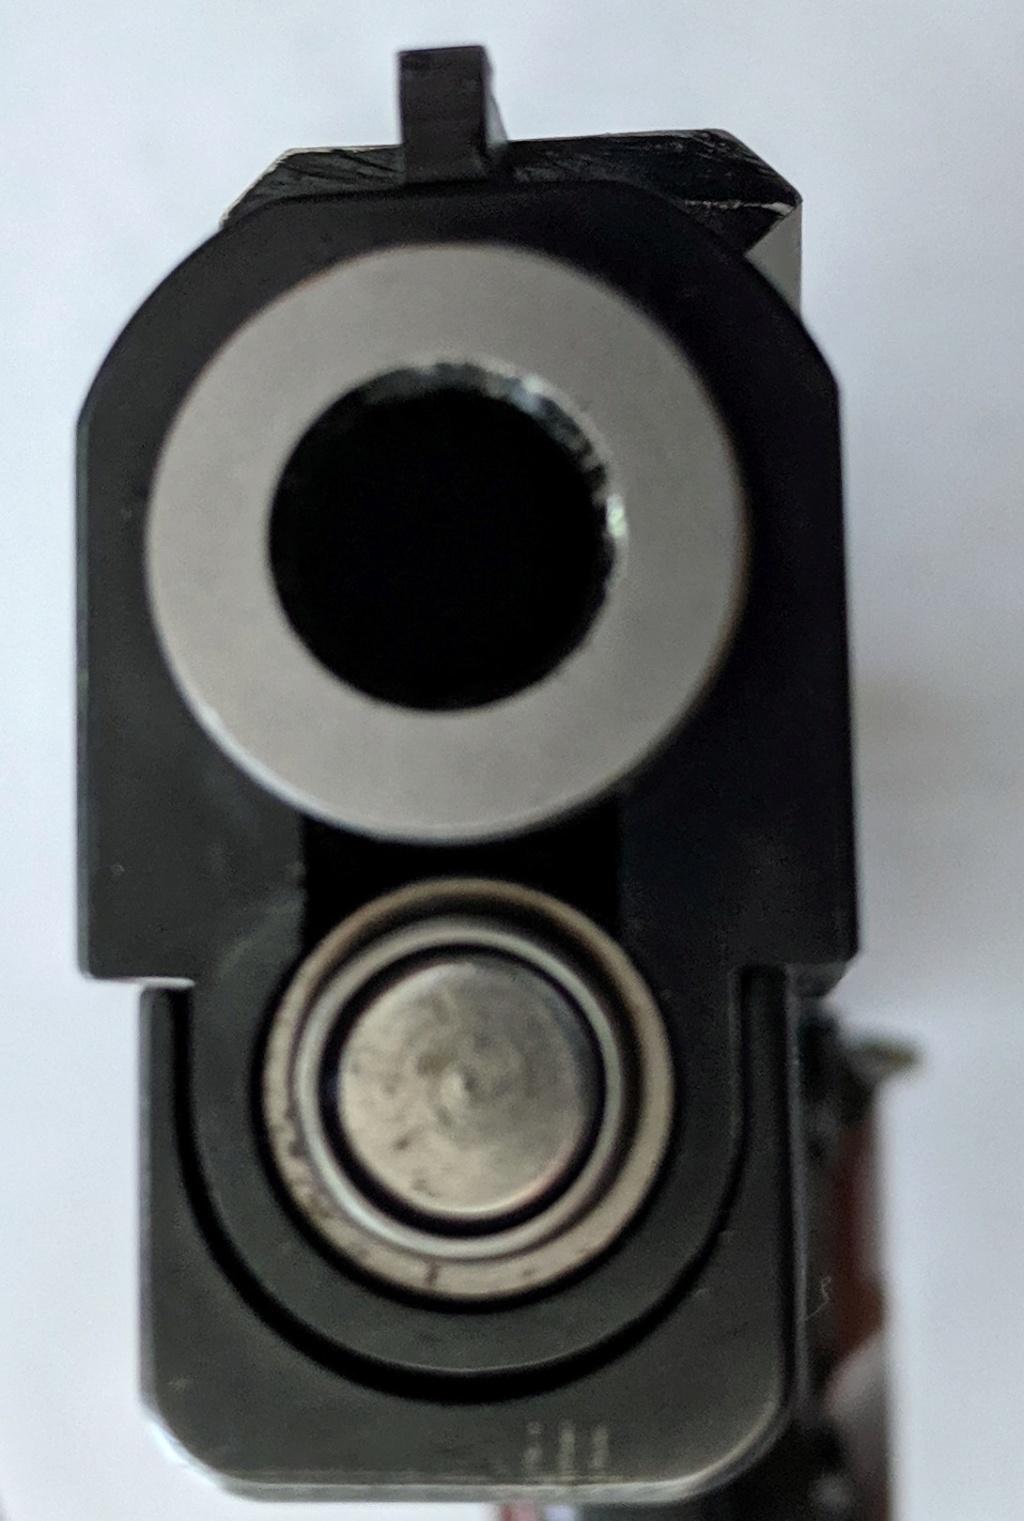 Sold Pending Funds - STI 1911 Range Master 38 Super Img_2231